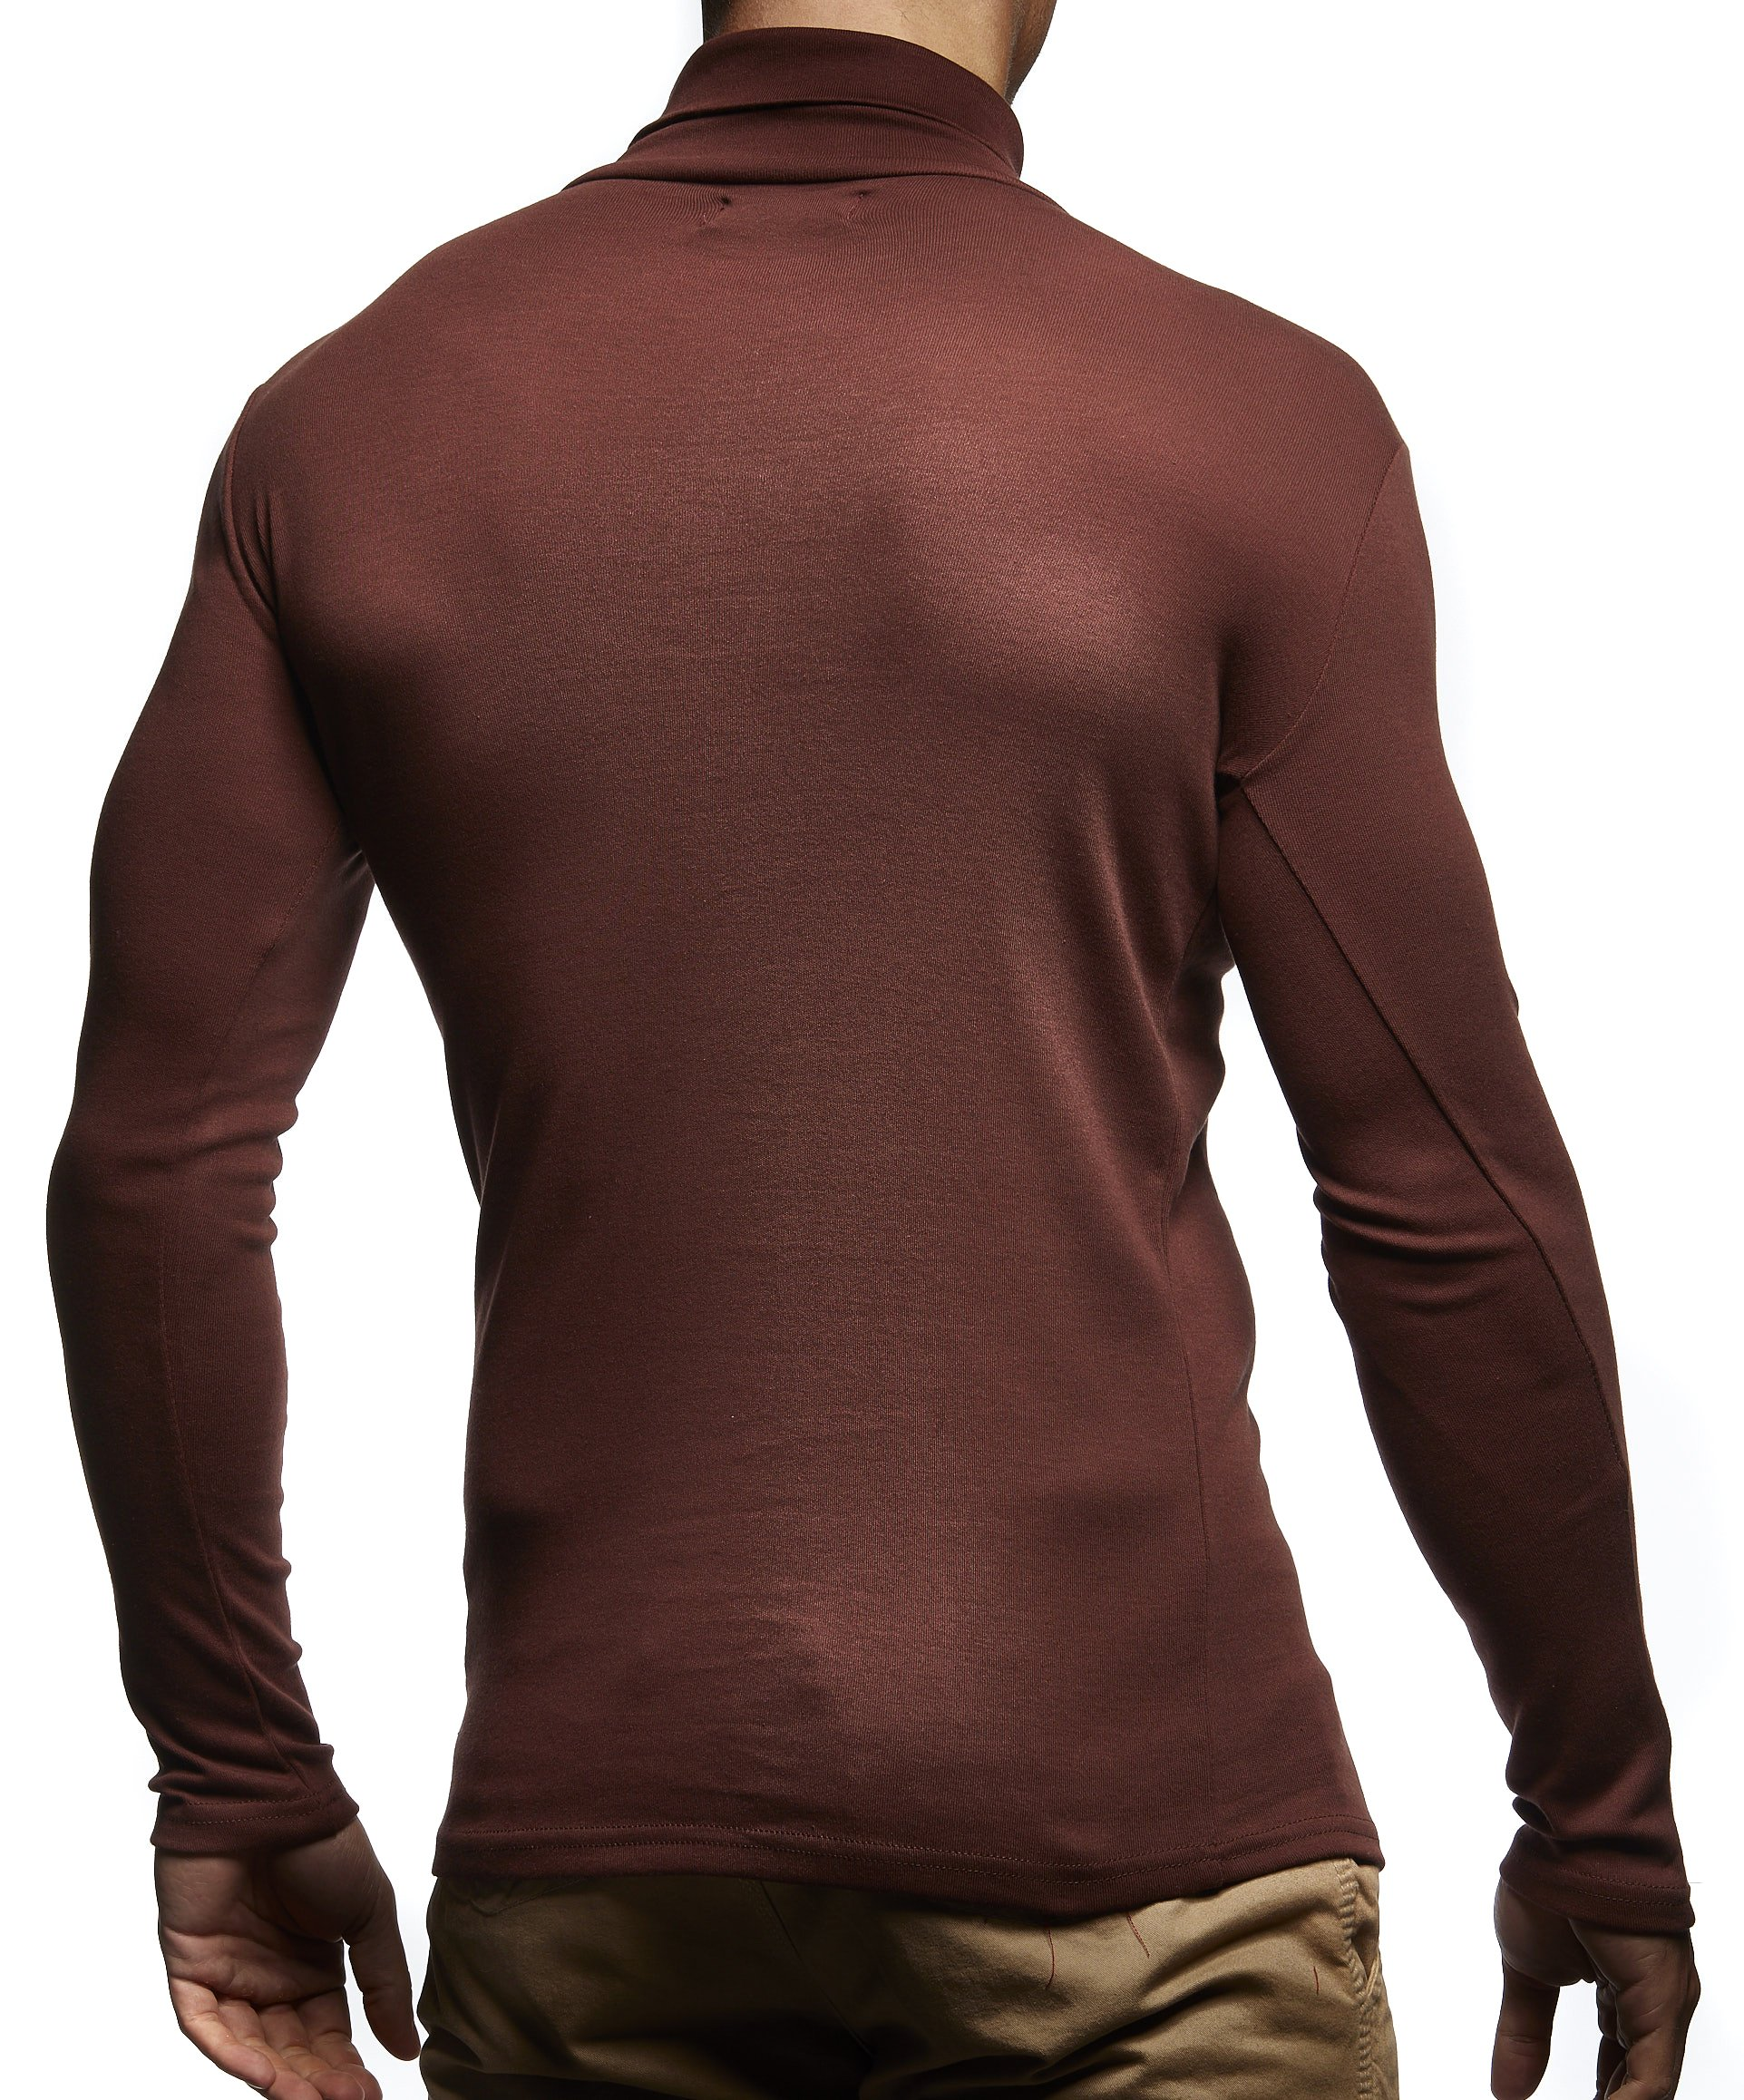 bb7bc6eb39c1 Leif-Nelson-Herren-Rollkragenpullover-Pullover-Rollkragen-Hoodie-Sweatshirt